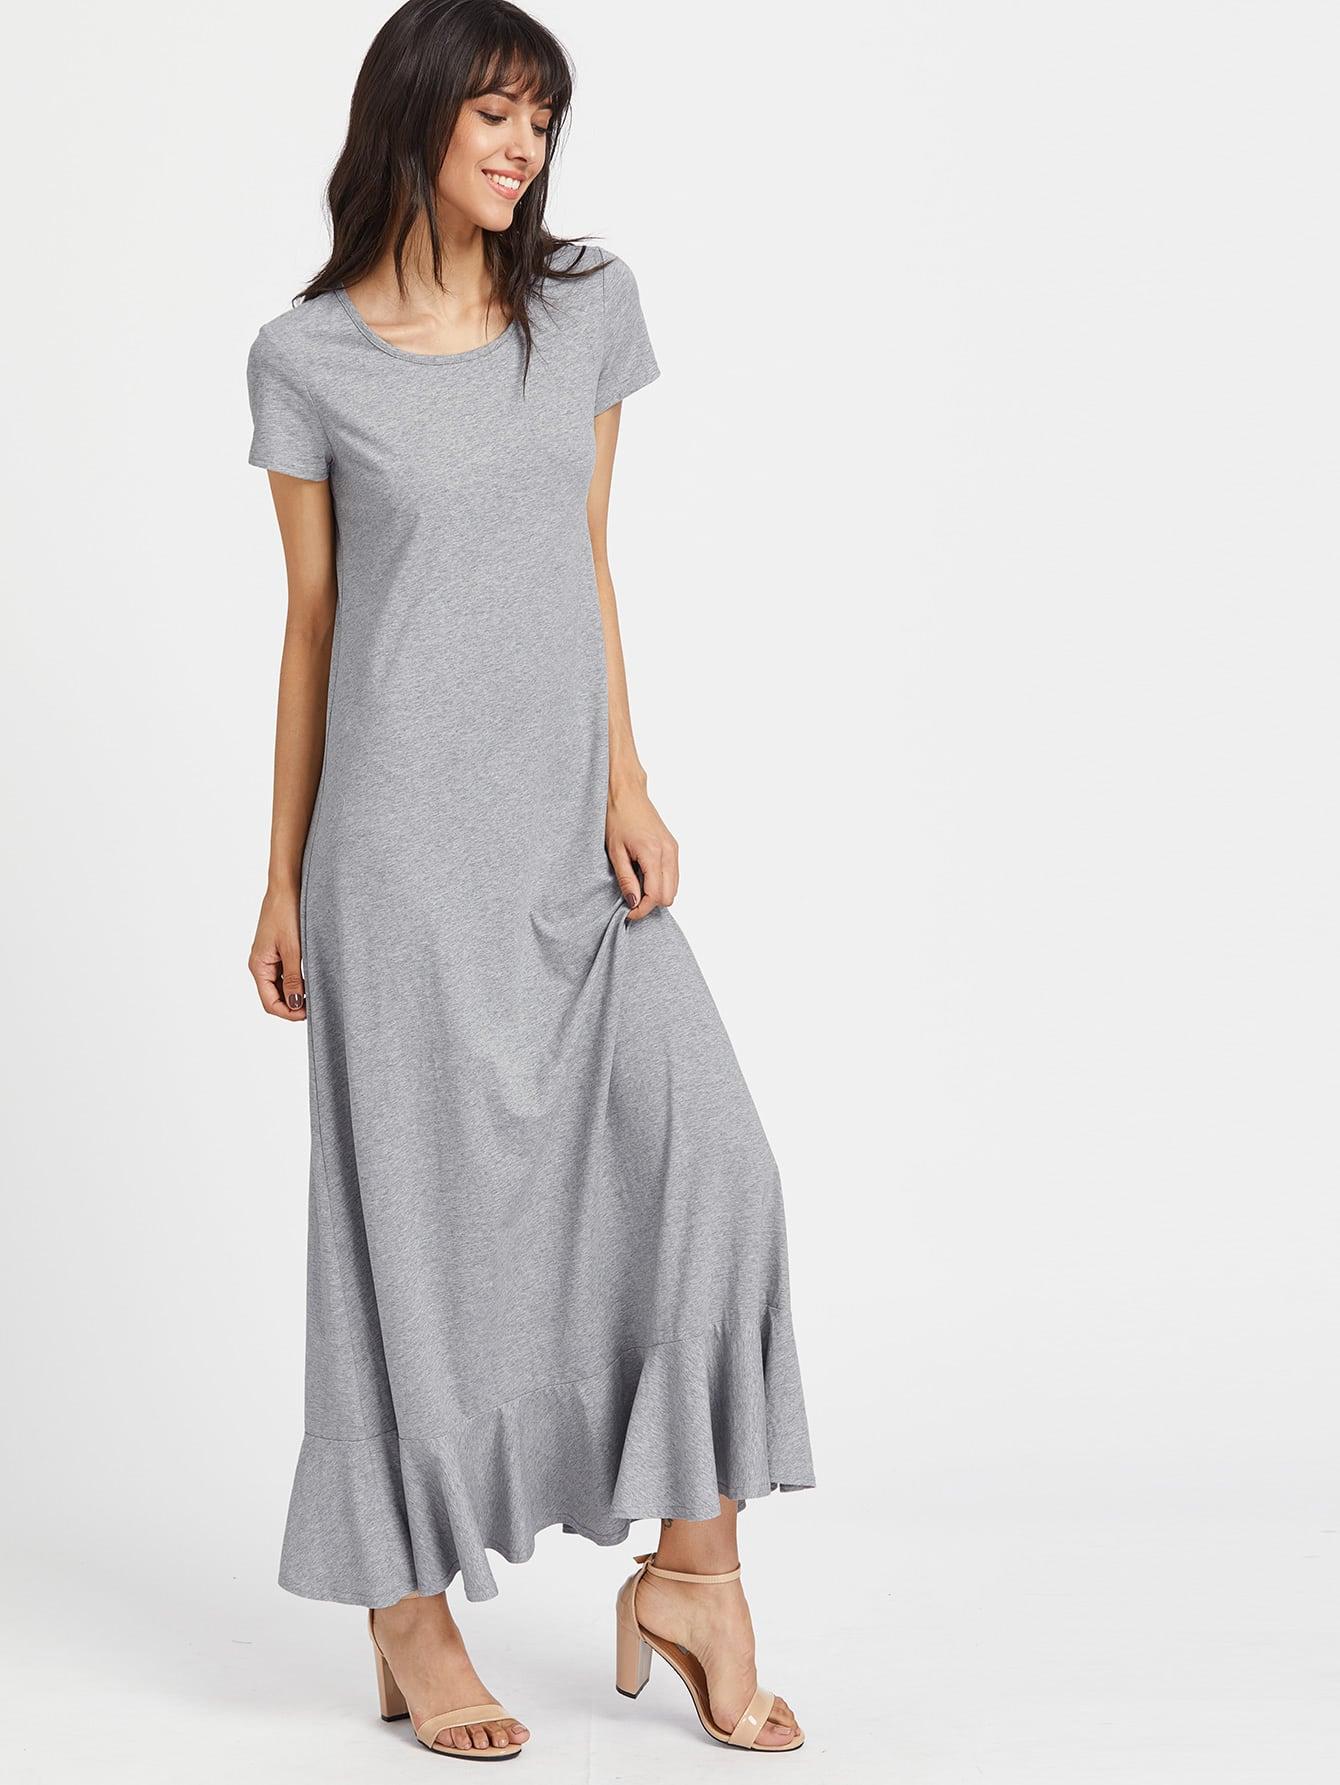 Фото Ruffle Trim Heathered Maxi Tee Dress. Купить с доставкой